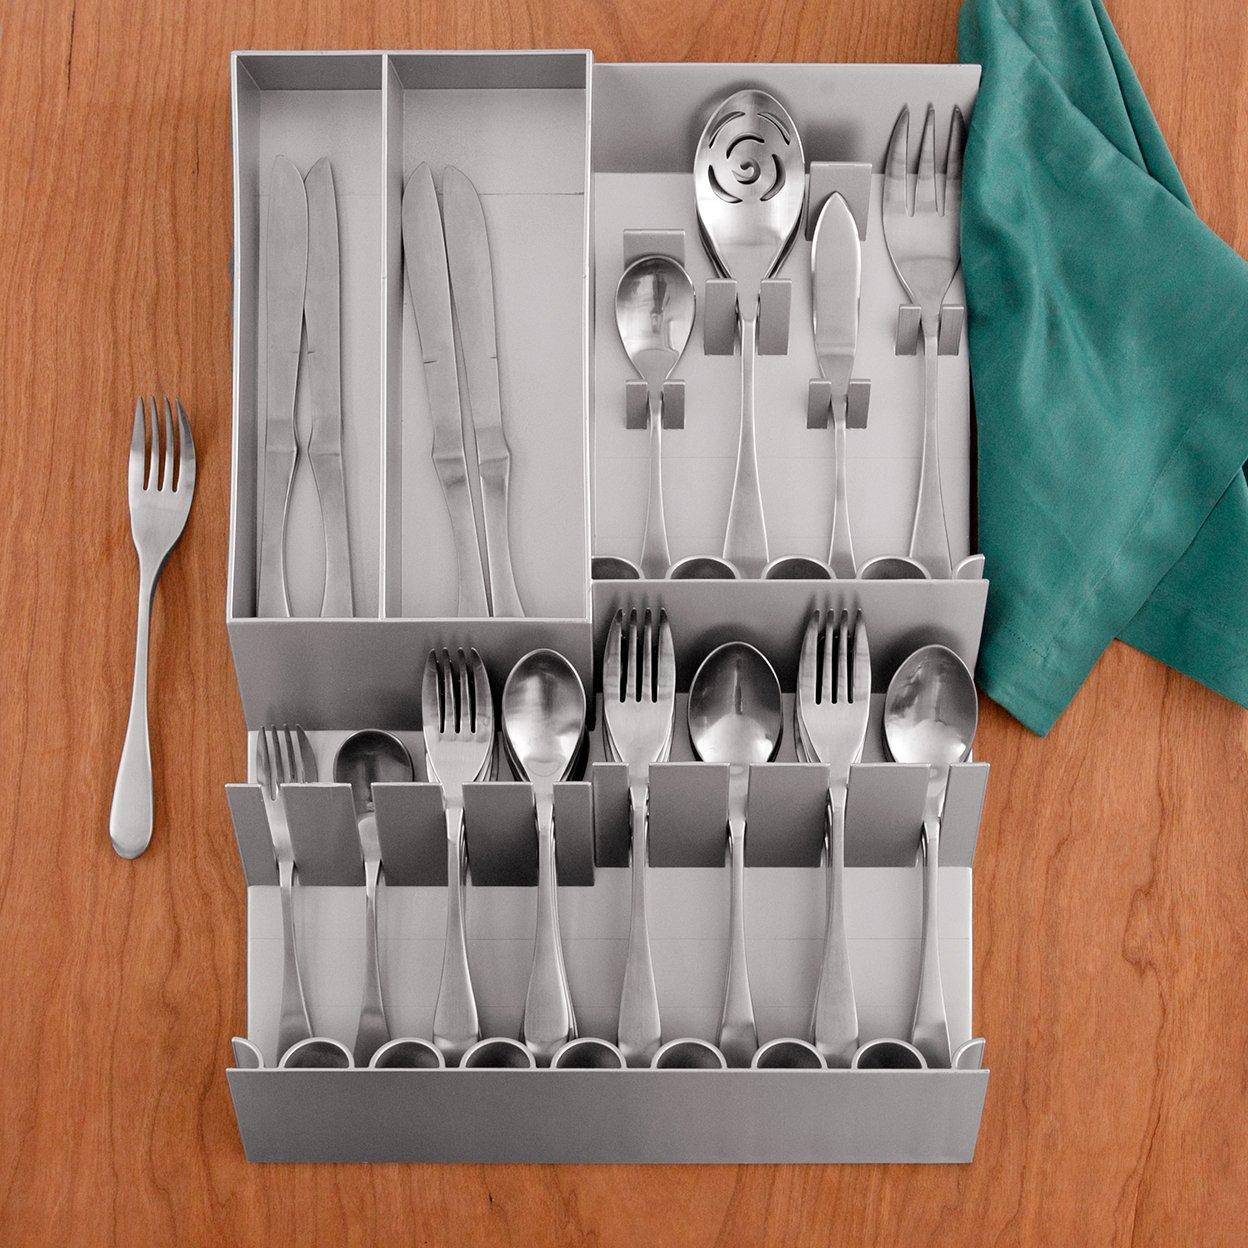 Charmant Amazon.com: Knork Flatware Storage Tray, Silver: Knork Flatware Storage  Tray: Kitchen U0026 Dining